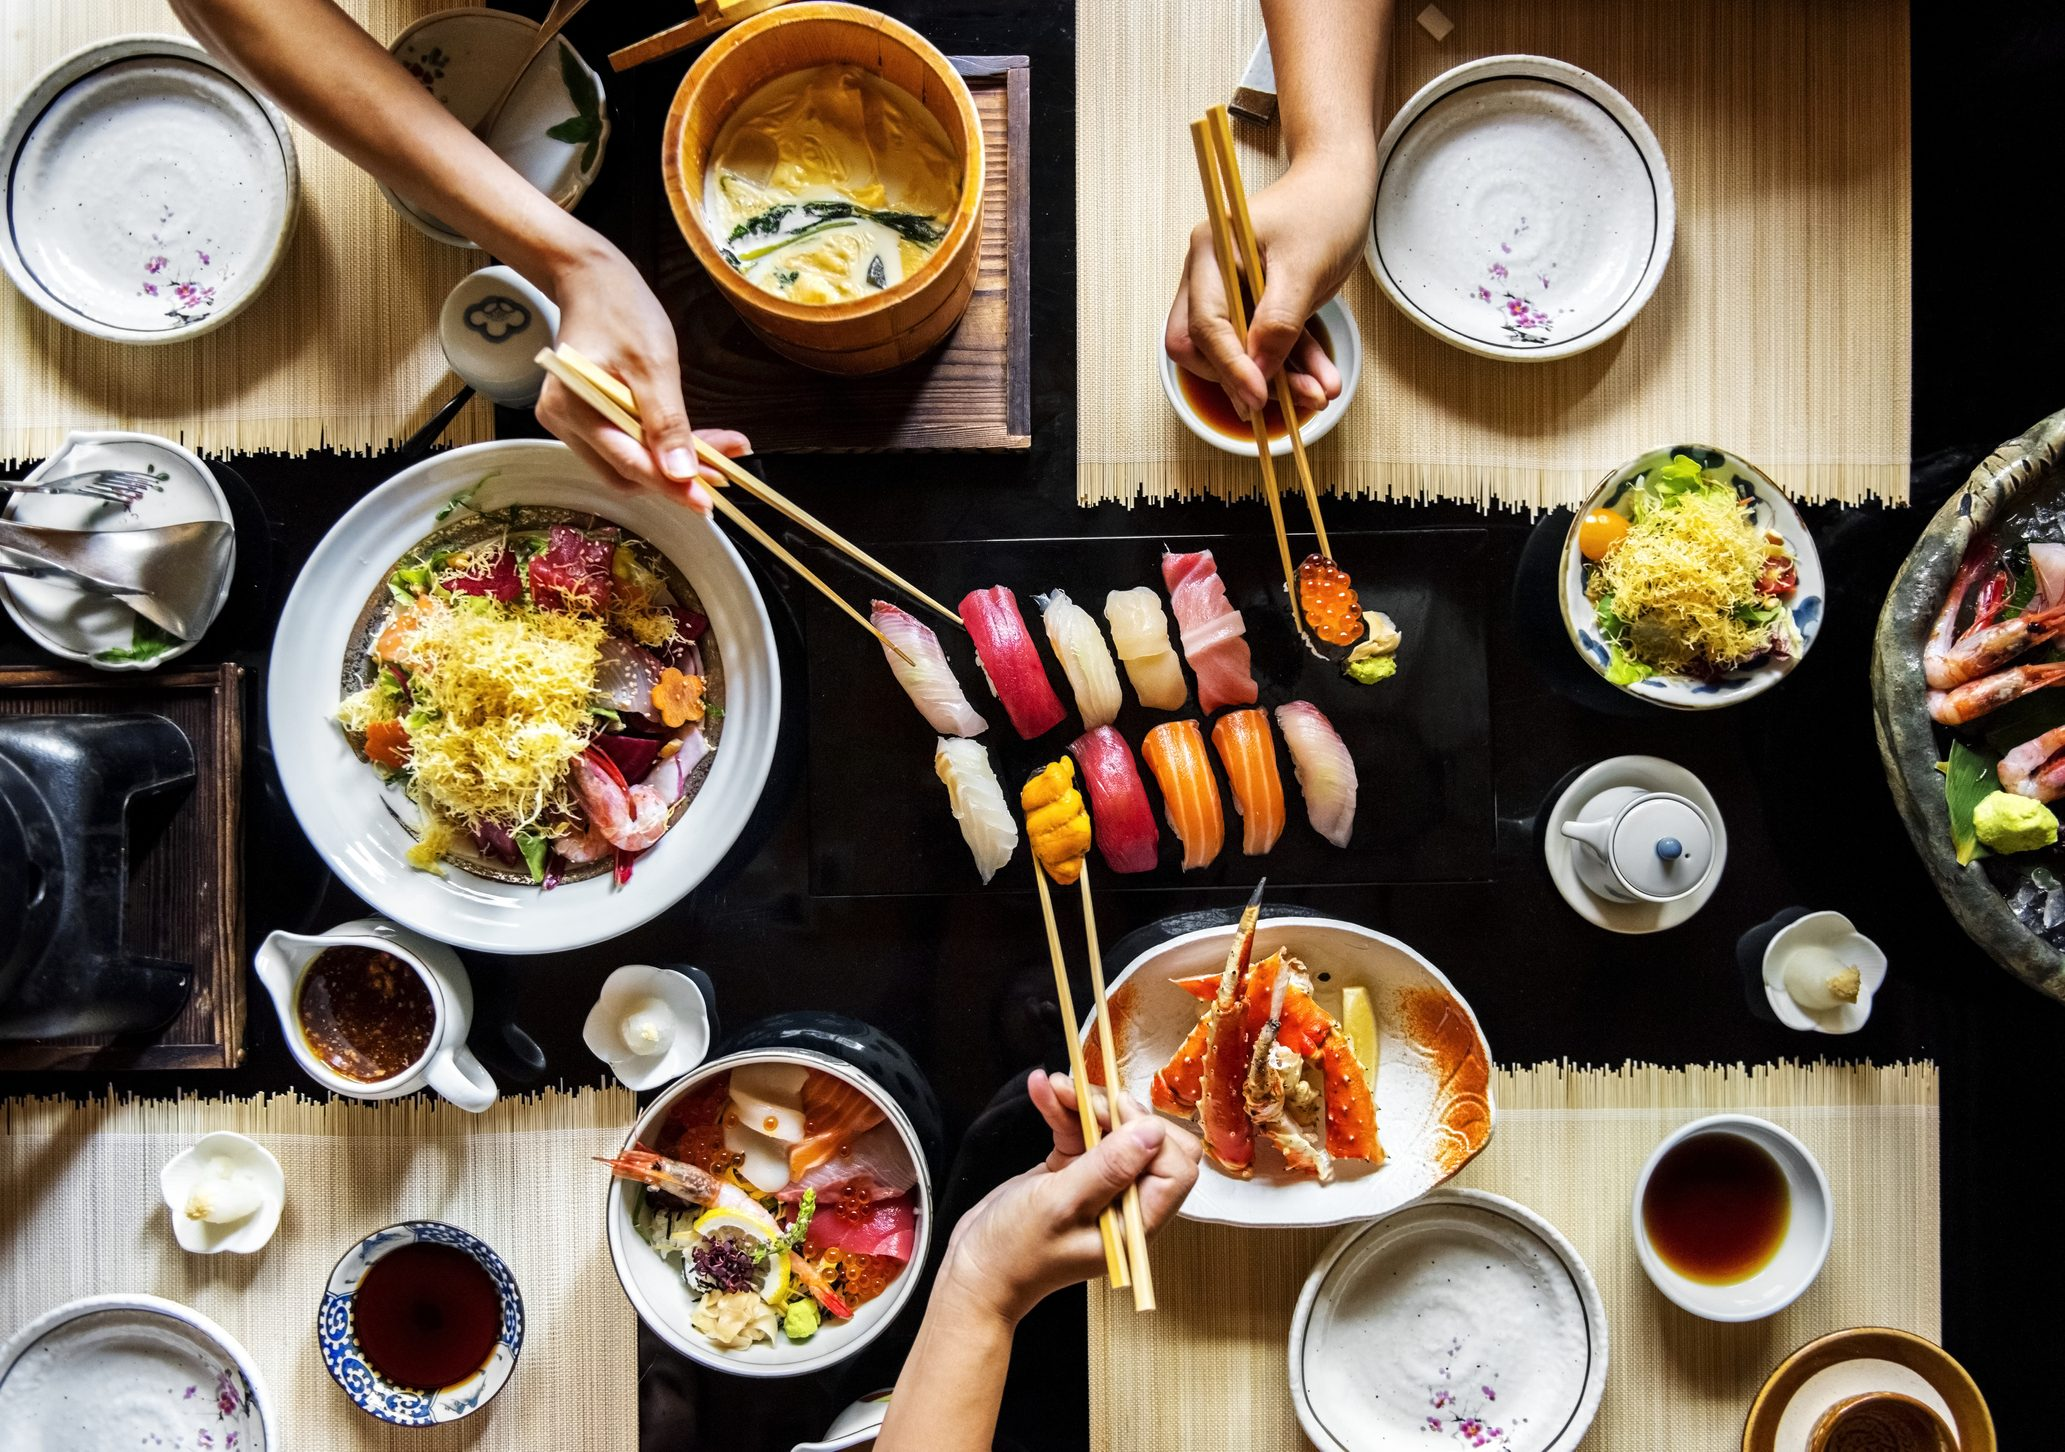 cibo giapponese per dimagrire